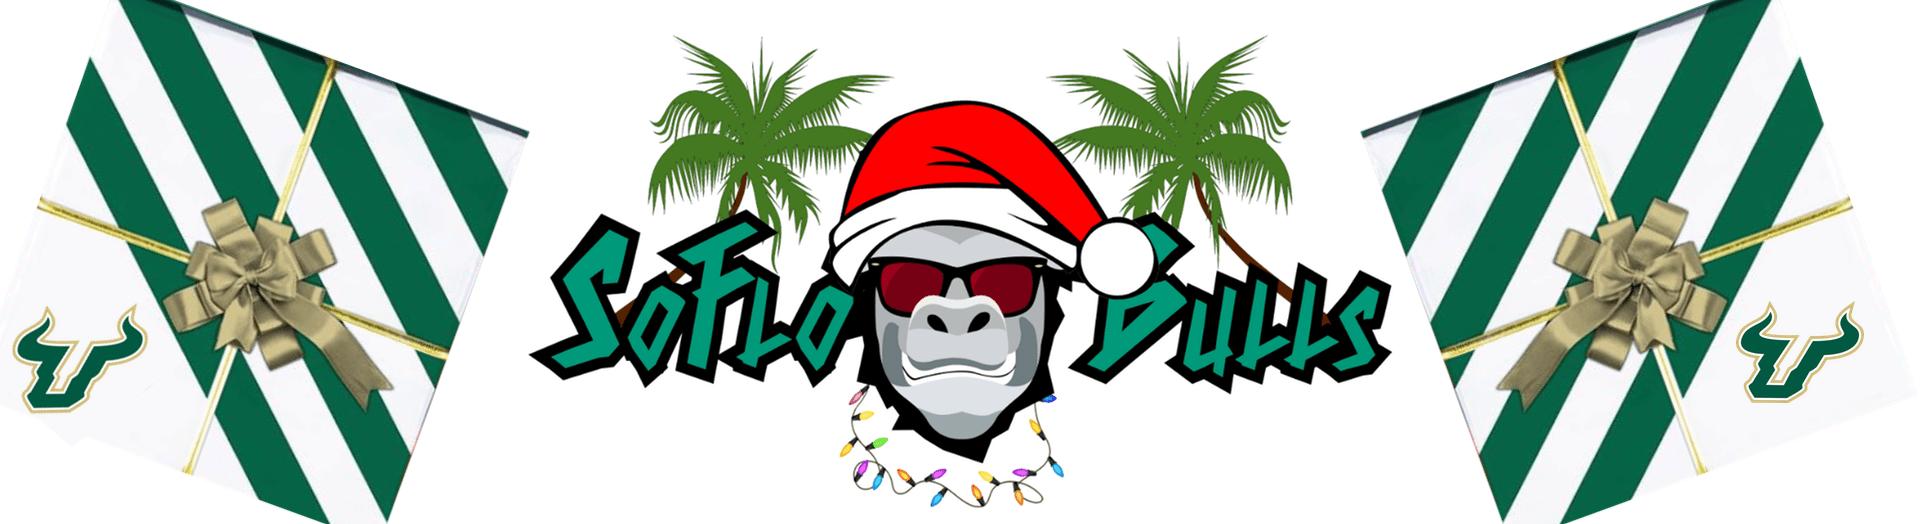 Merry Christmas from the boys at SoFloBulls.com 2016 Header Image ...